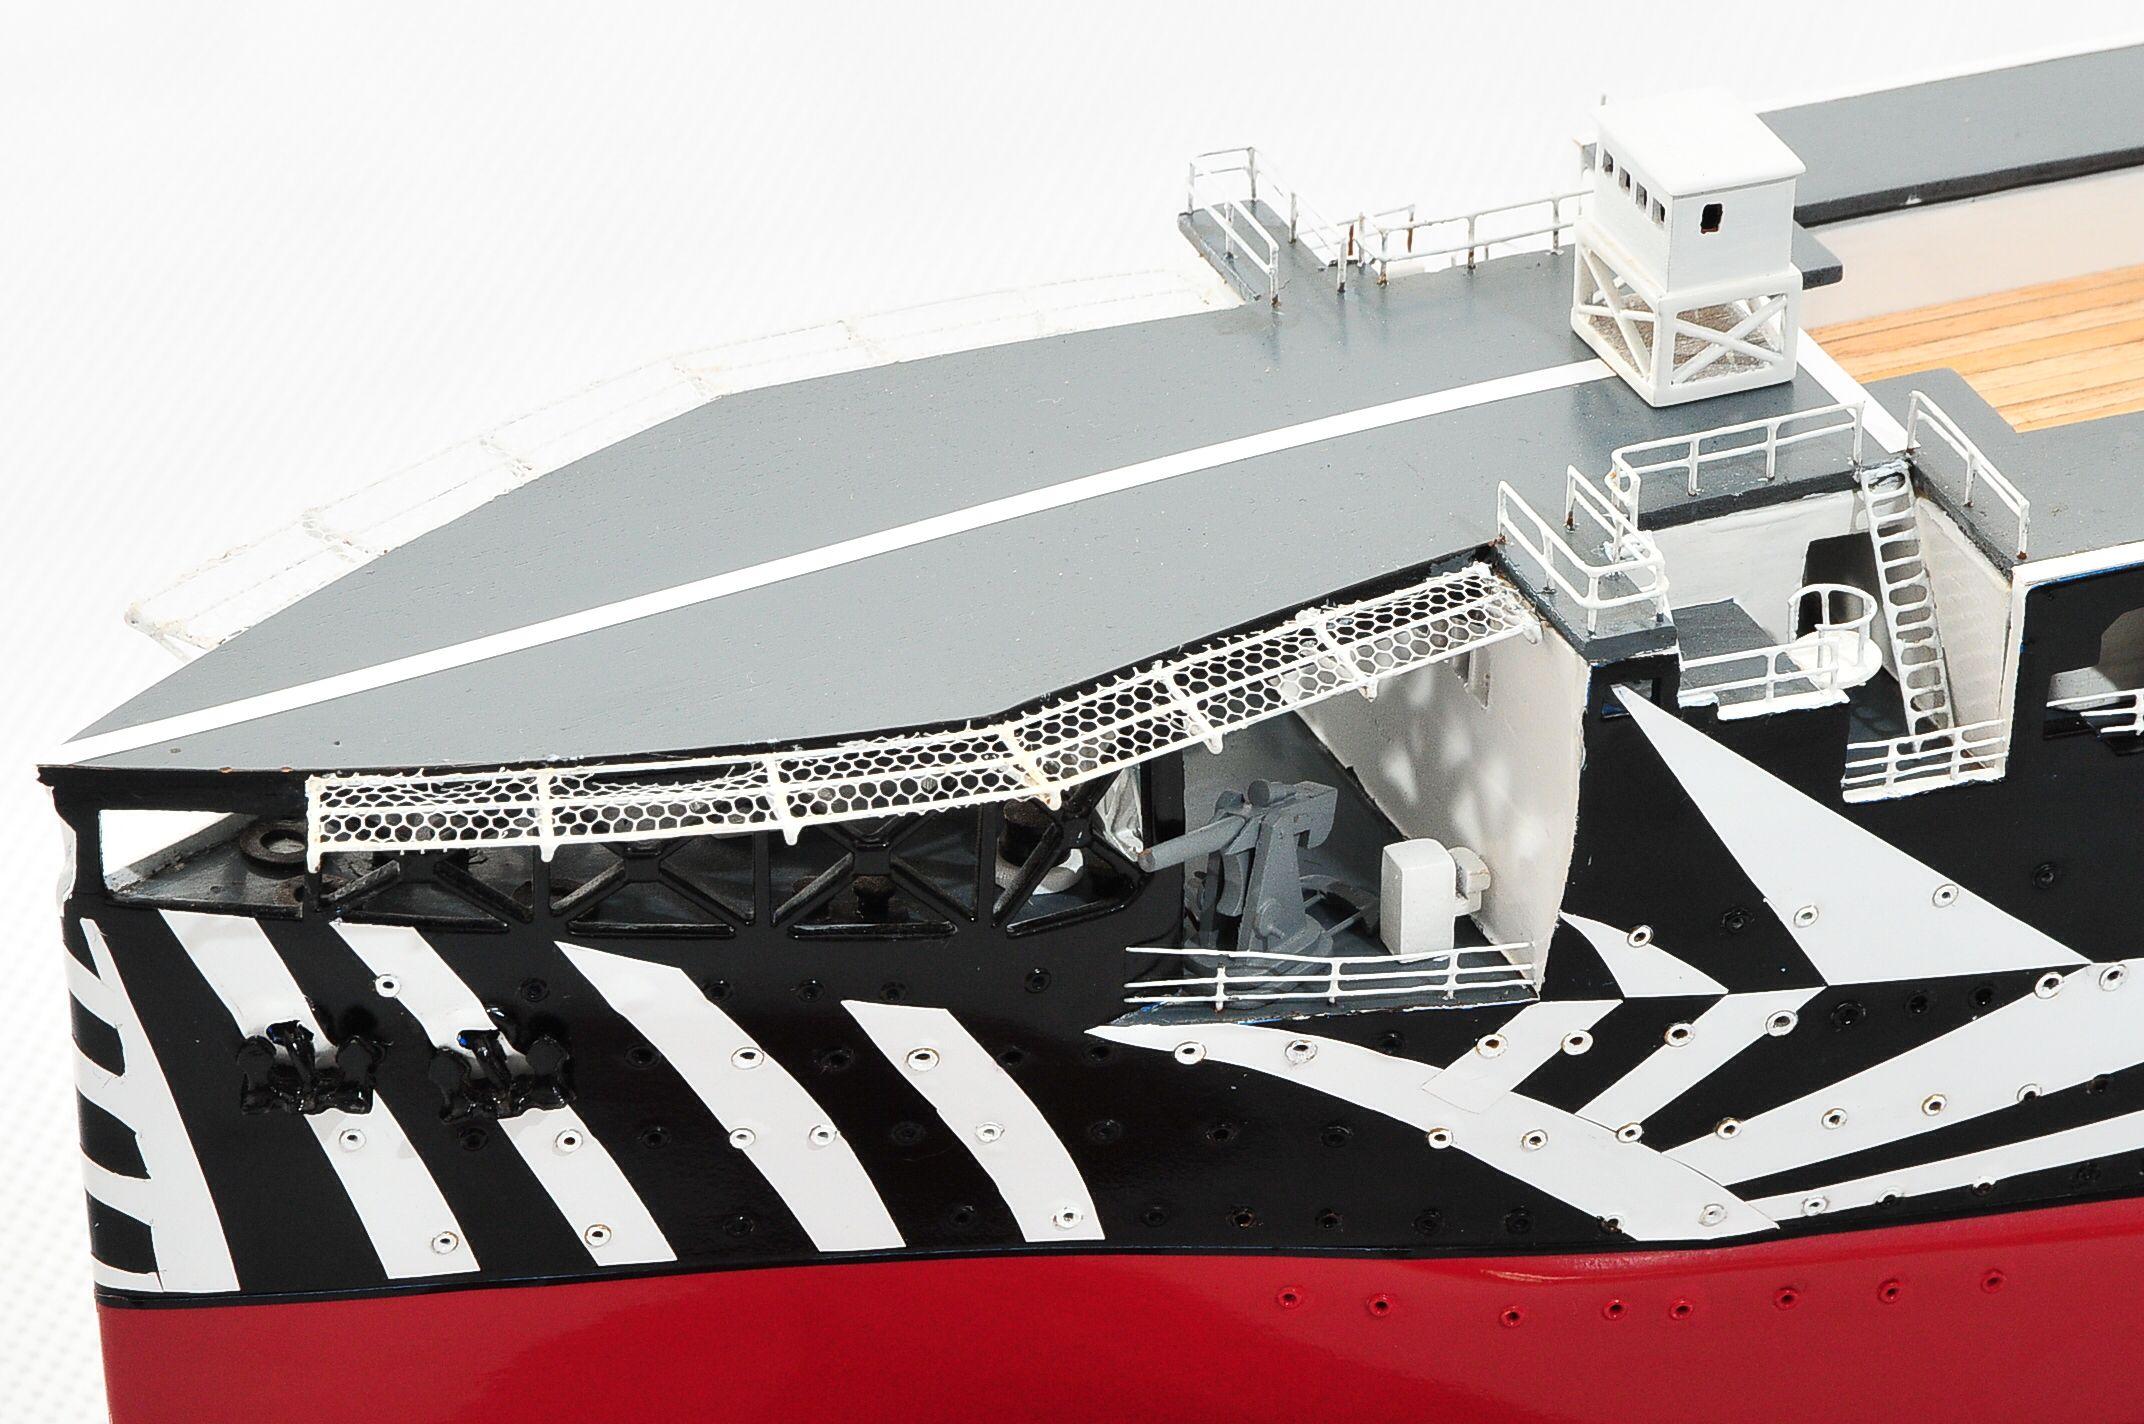 663-6125-HMS-Argus-Model-Boat